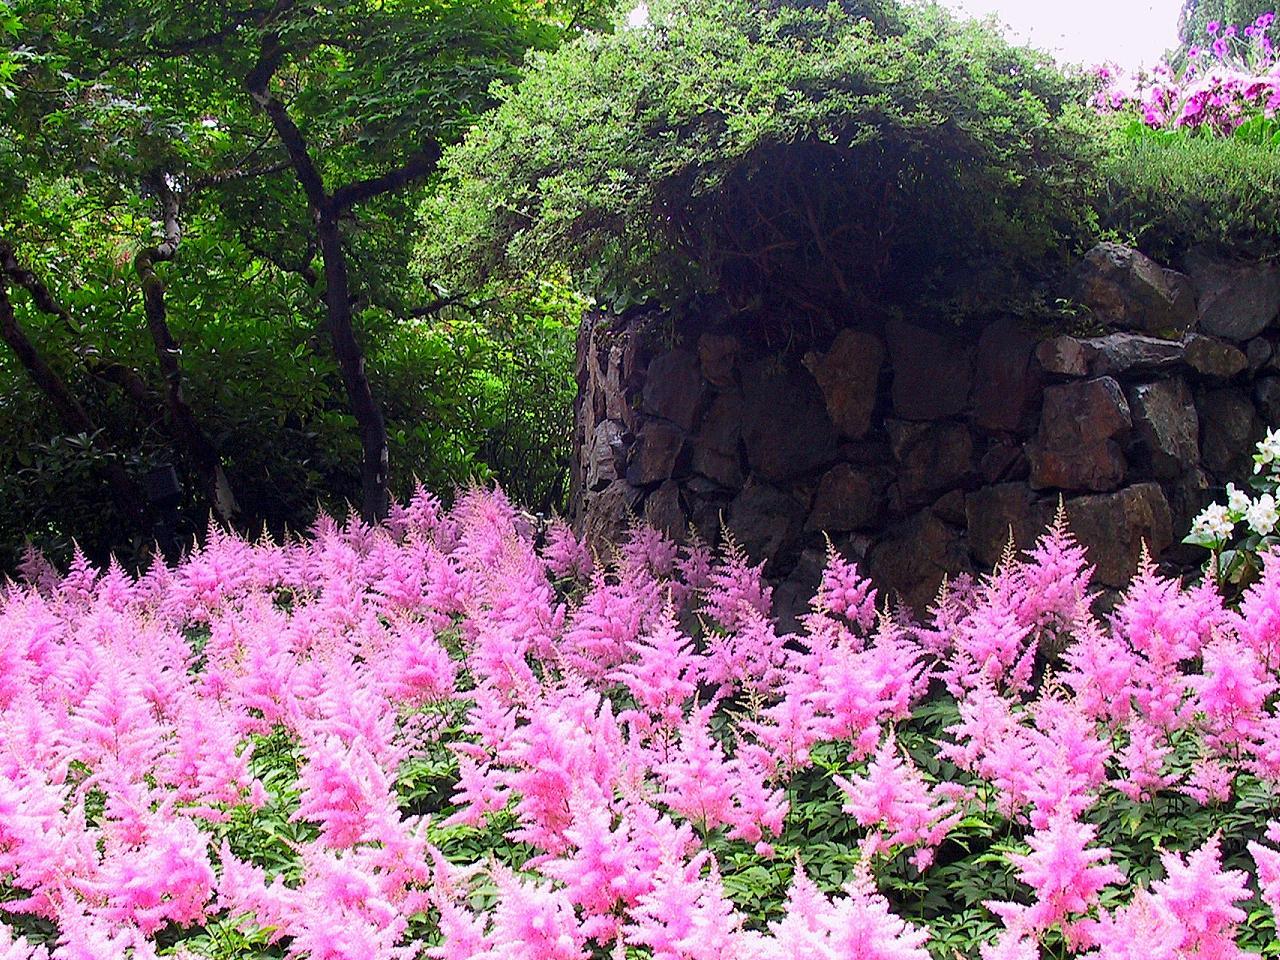 Amazingly Pink Garden by misterkyle